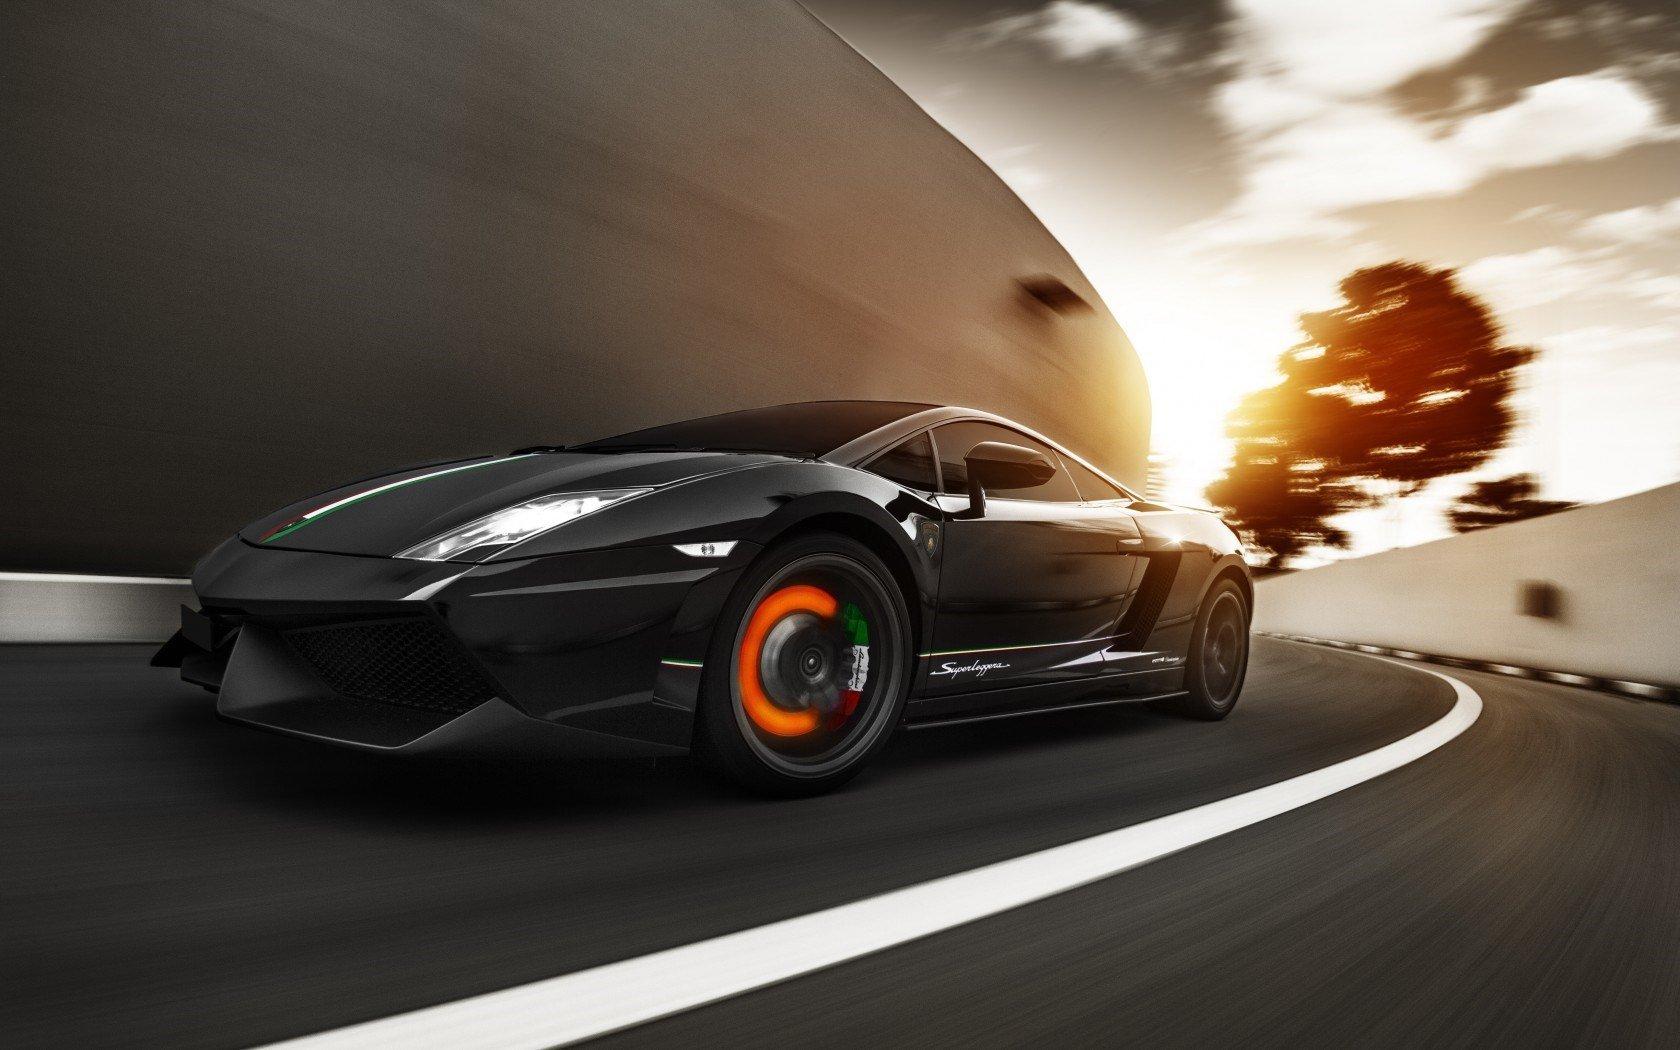 Awesome Lamborghini Gallardo Free Background ID:293076 For Hd 1680x1050  Computer